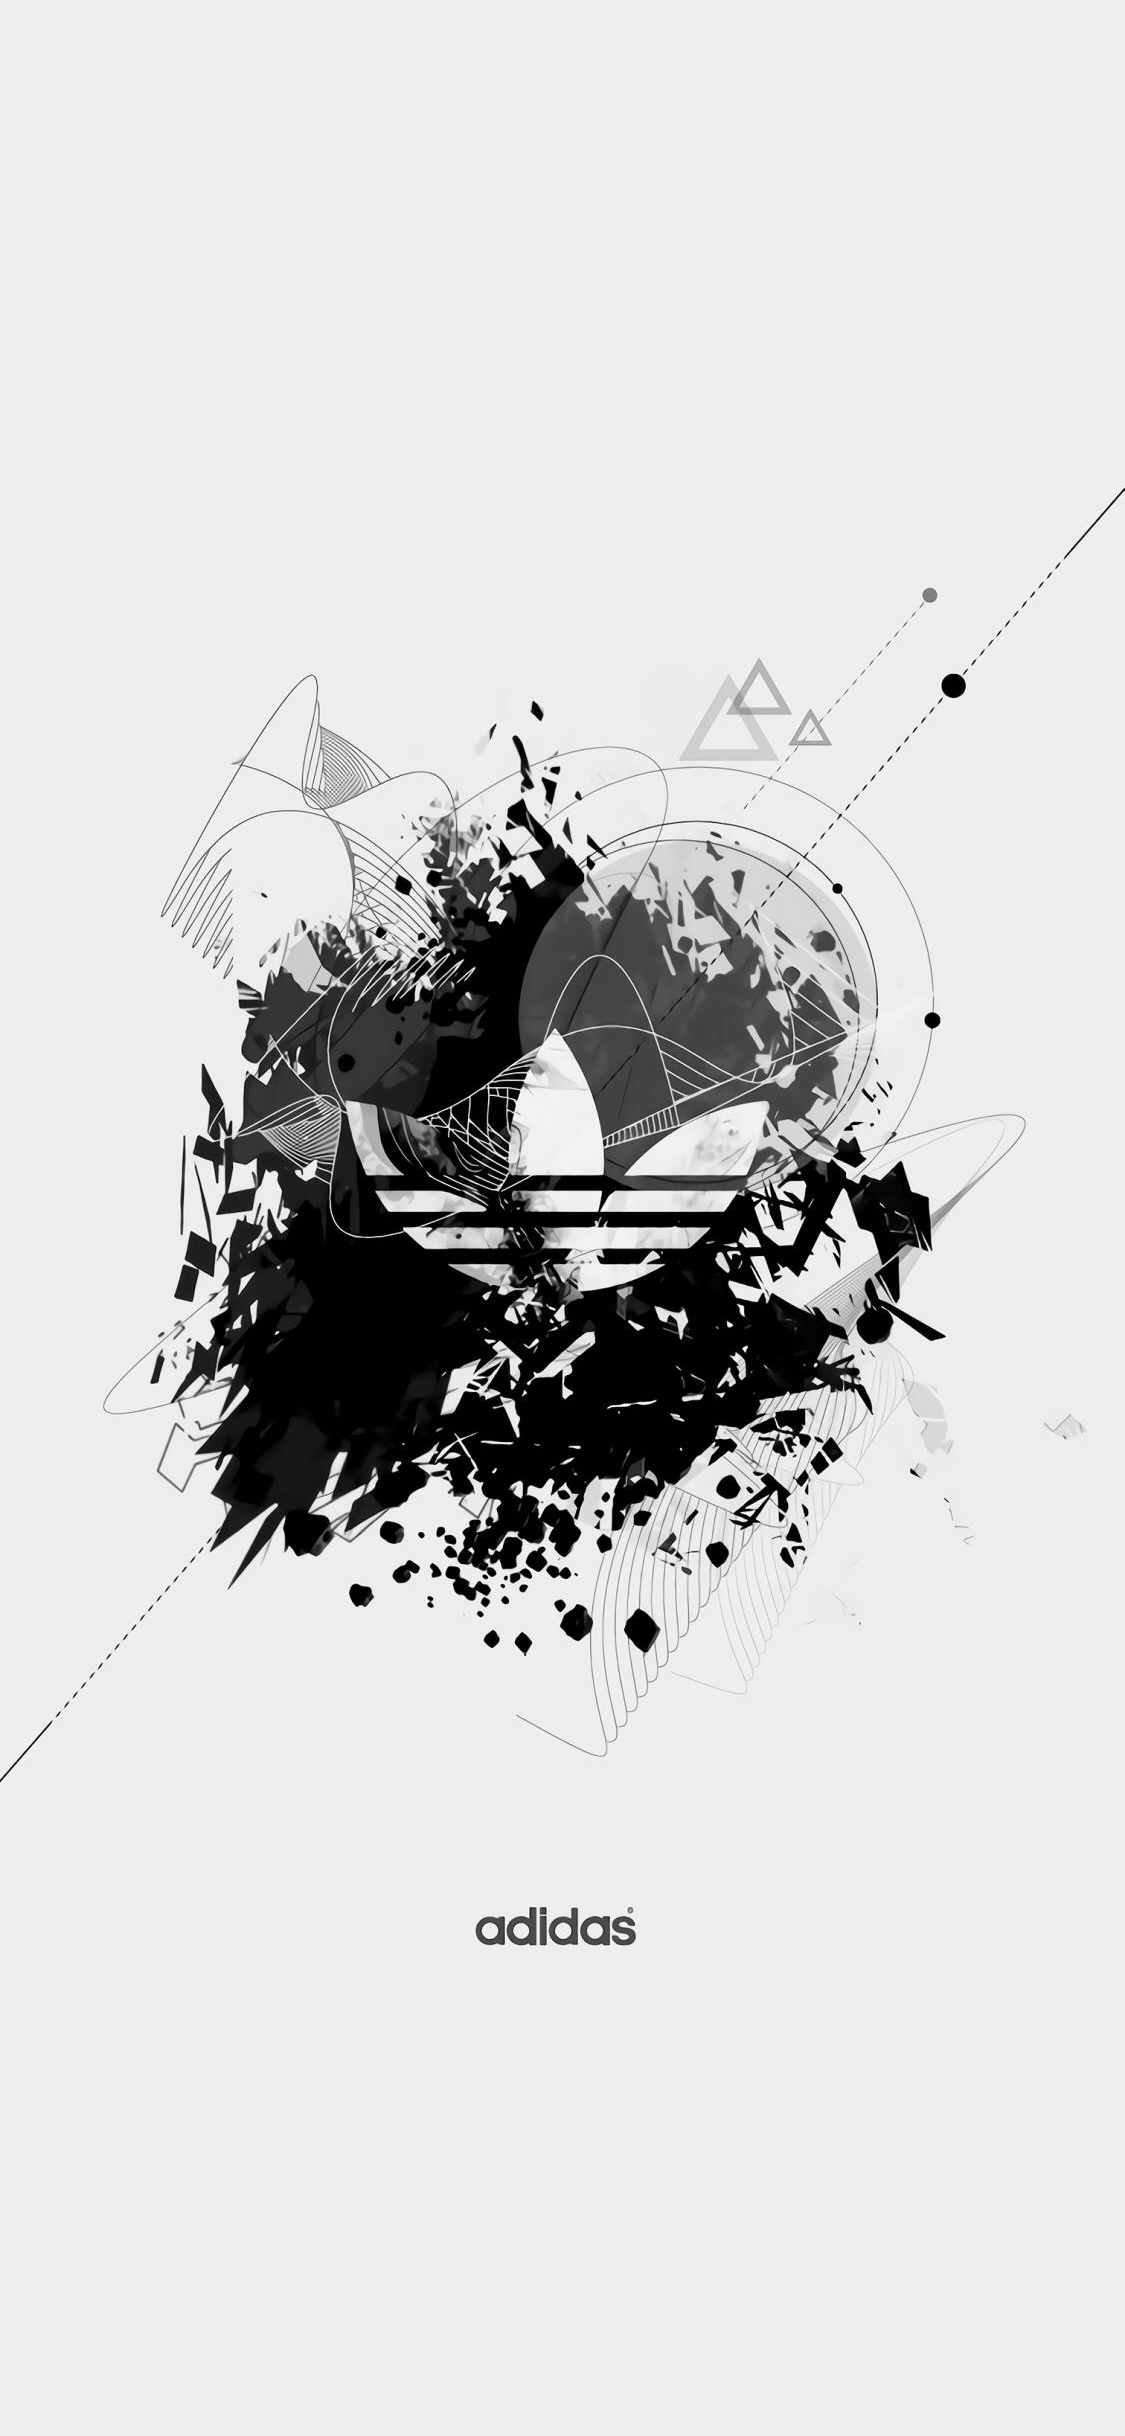 adidas 品牌 运动 logo 三叶草 阿迪达斯图片